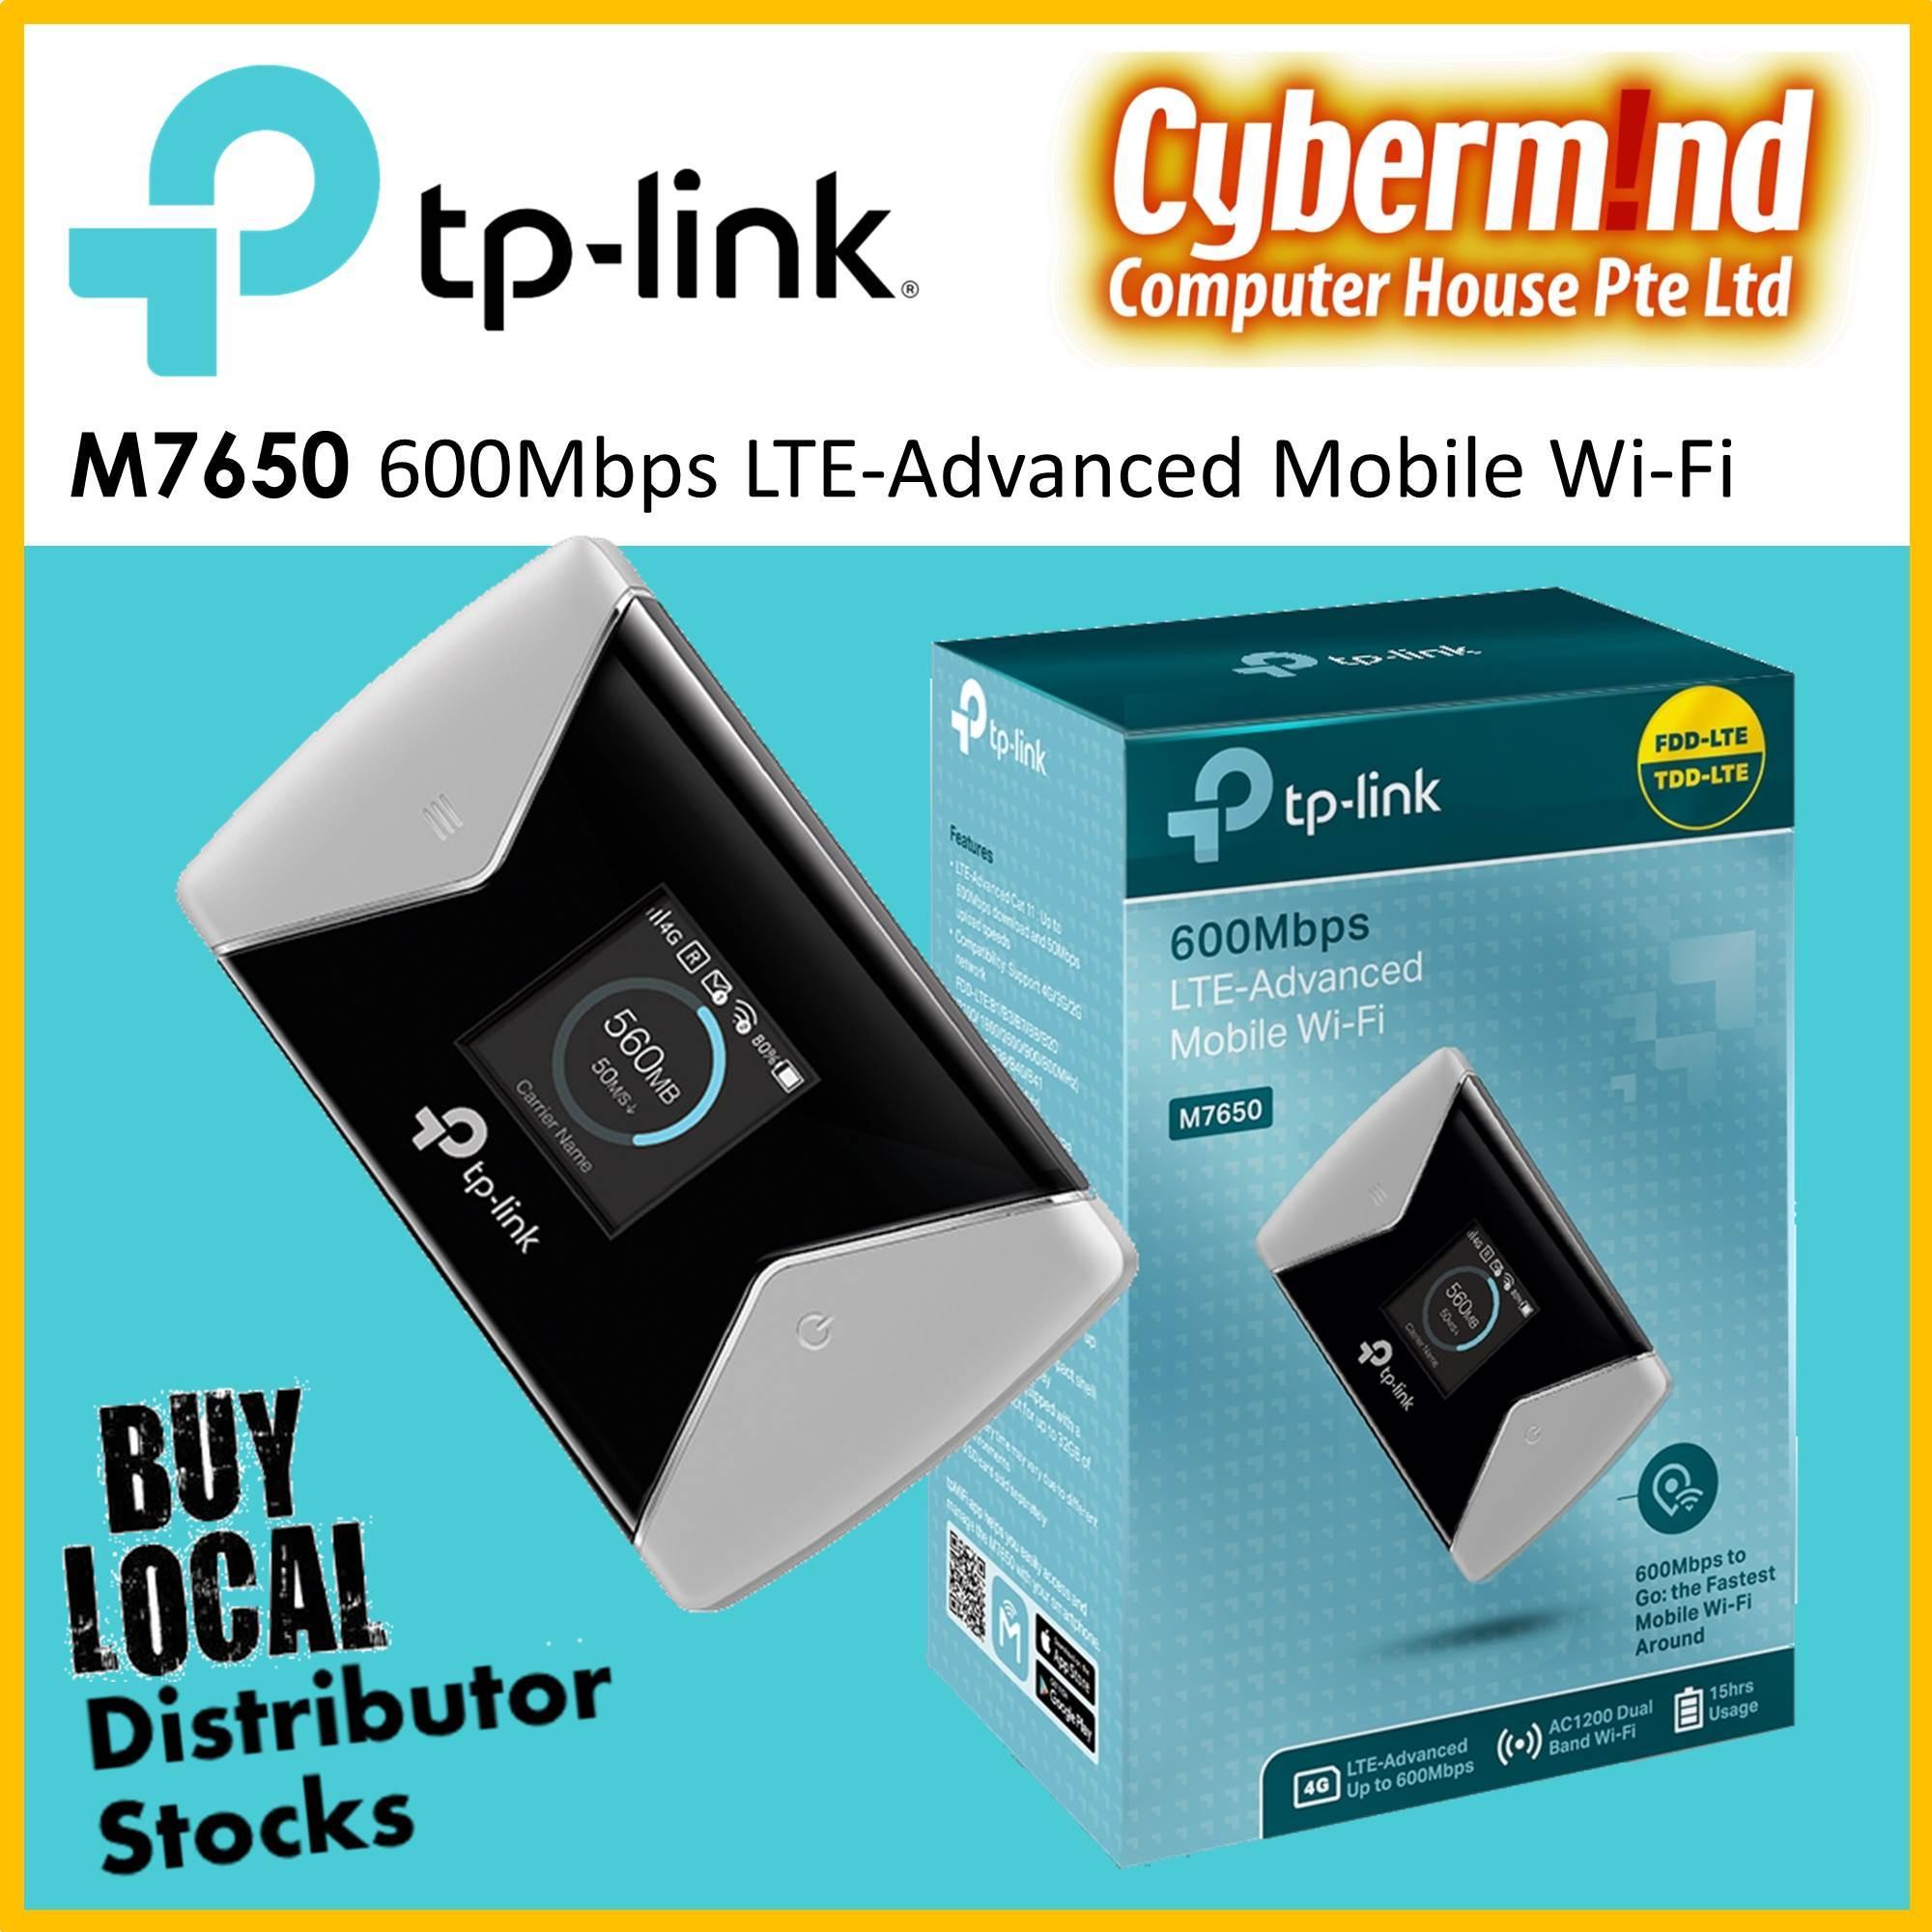 Latest Tp Link Mobile Broadband Products Enjoy Huge Discounts M7350 4g Lte Advanced Wifi Mifi Tplink M7650 600mbps Wi Fi